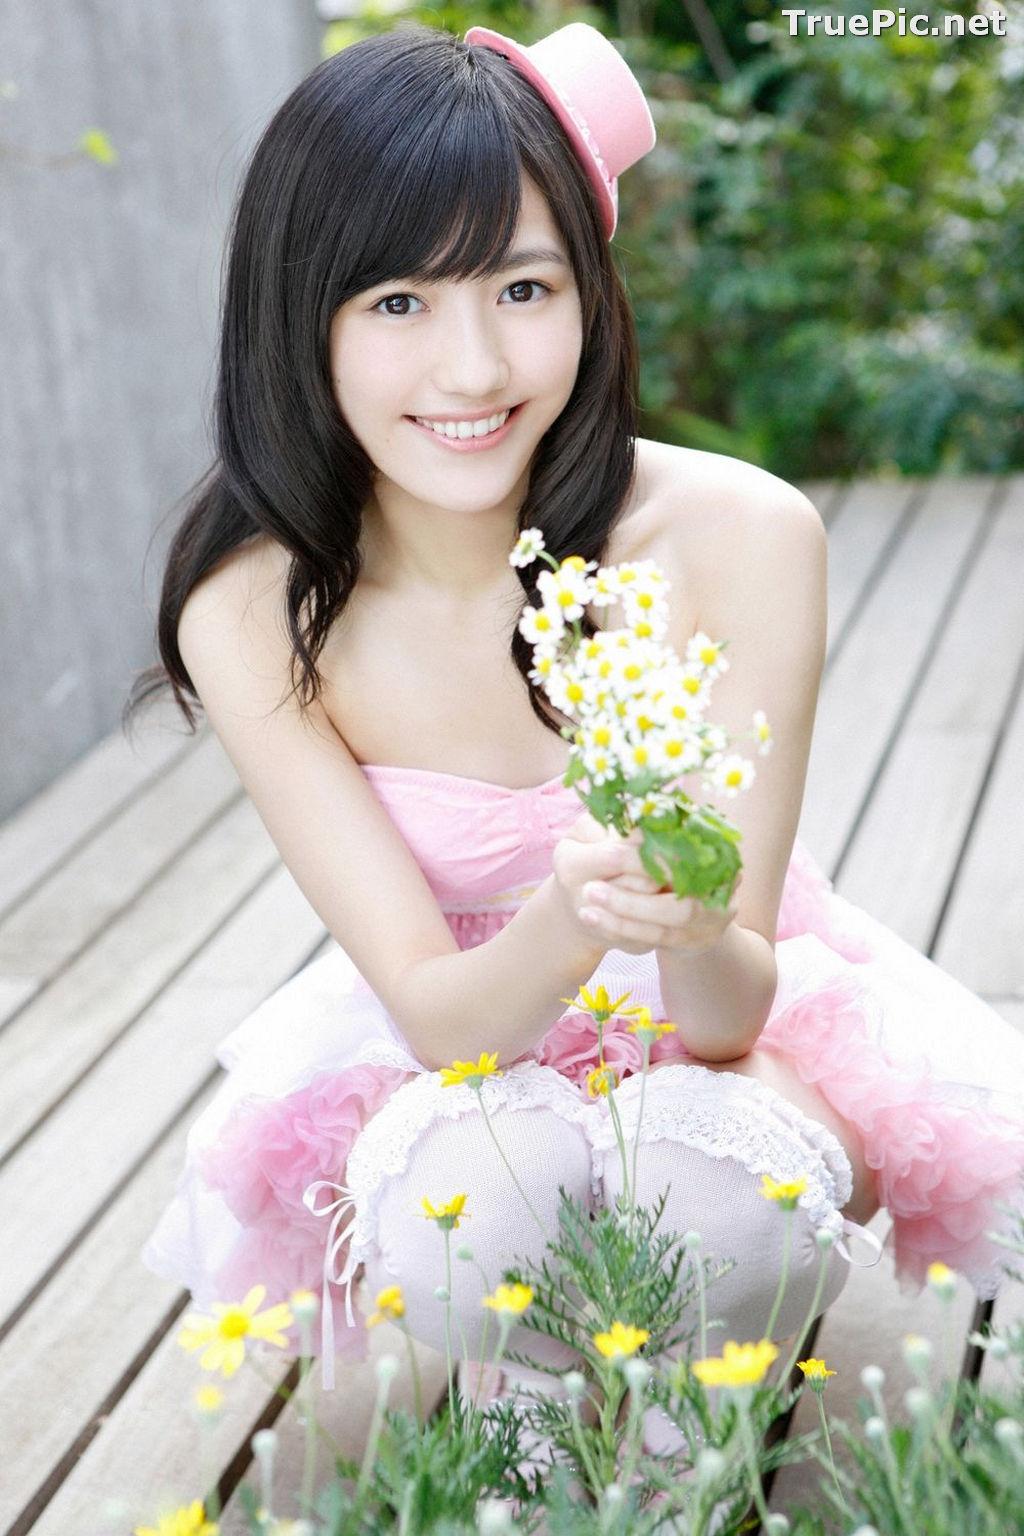 Image [YS Web] Vol.531 - Japanese Idol Girl Group (AKB48) - Mayu Watanabe - TruePic.net - Picture-4